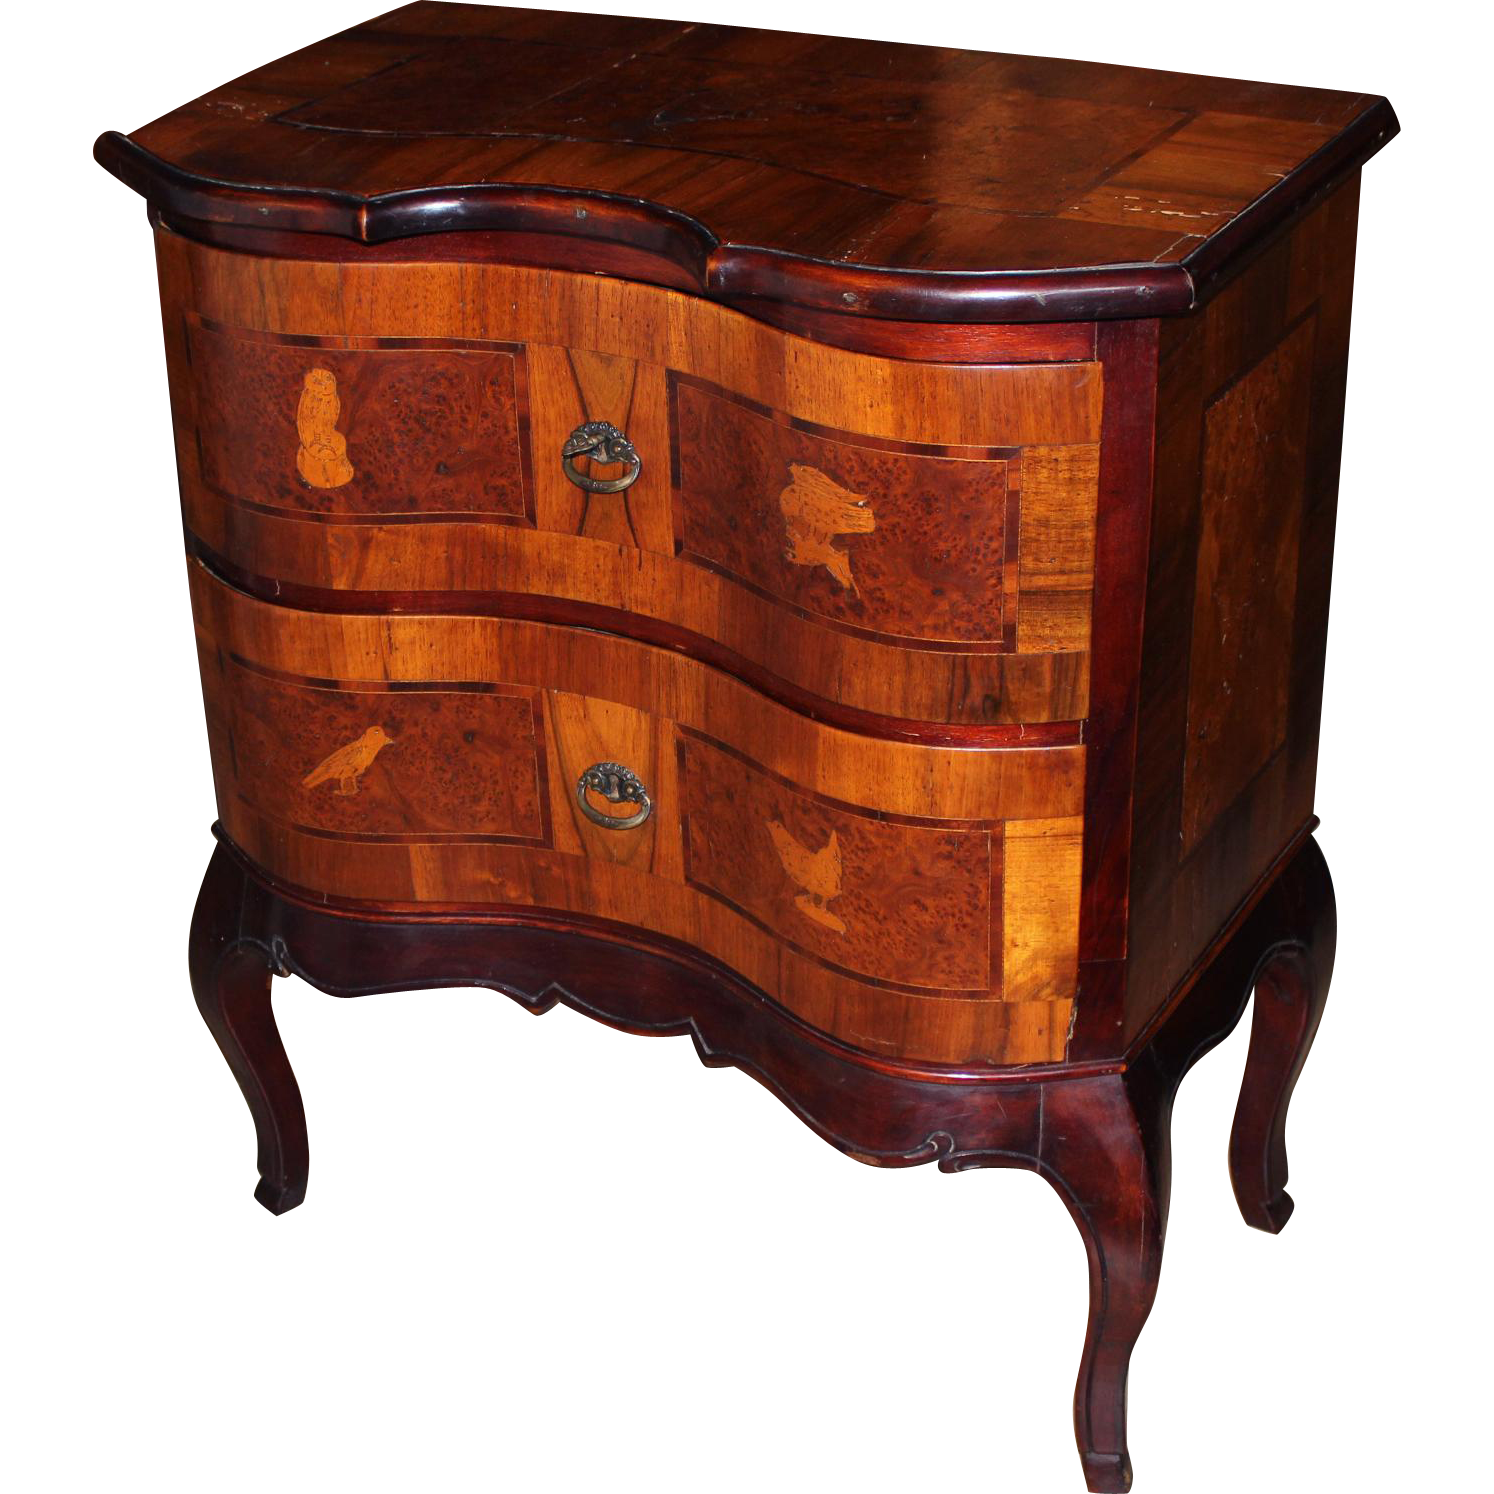 19th c Italian Walnut Veneer 2 Drawer Side Cabinet with Bird Inlay